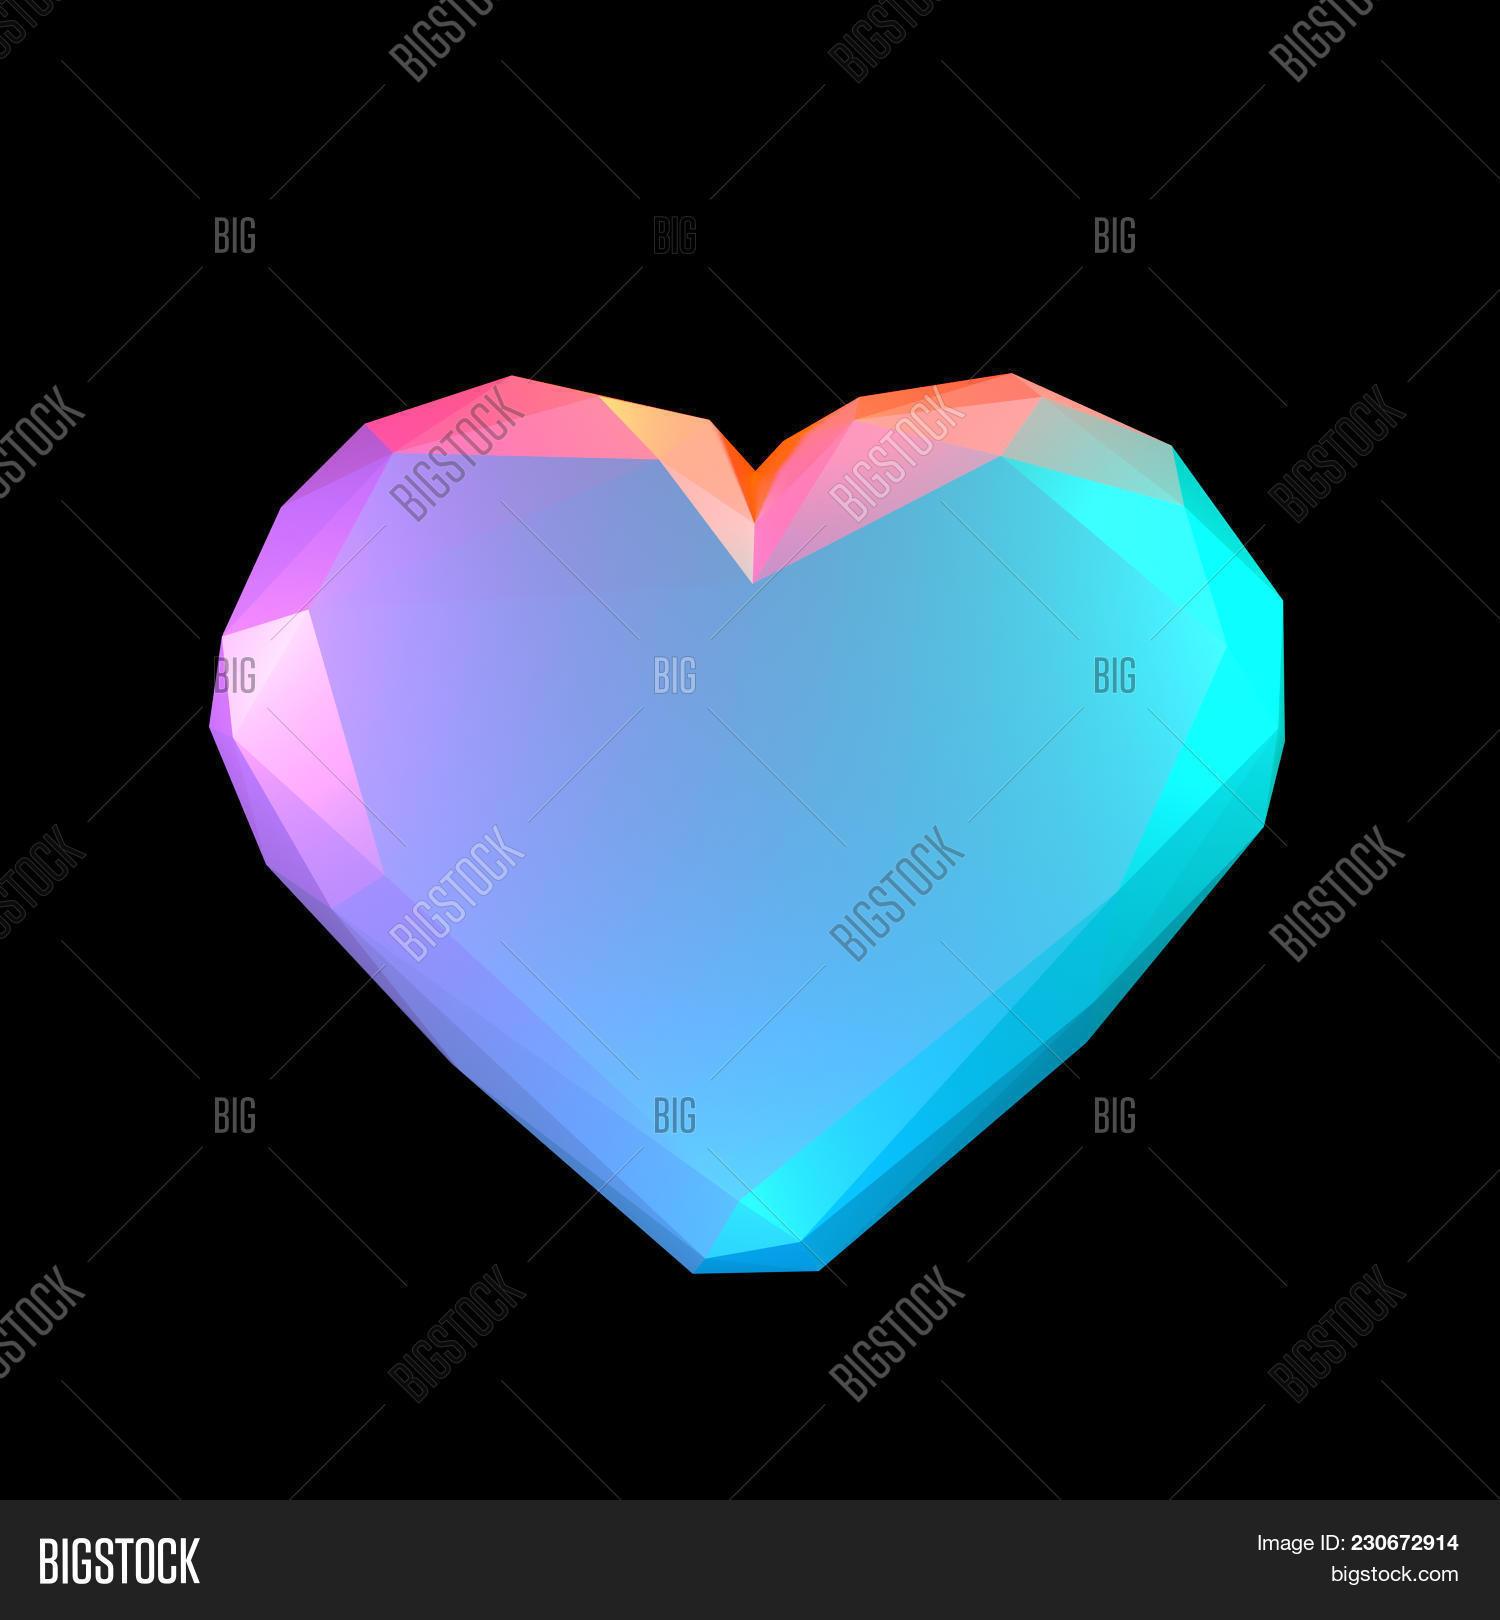 Heart On Black Image & Photo (Free Trial) | Bigstock